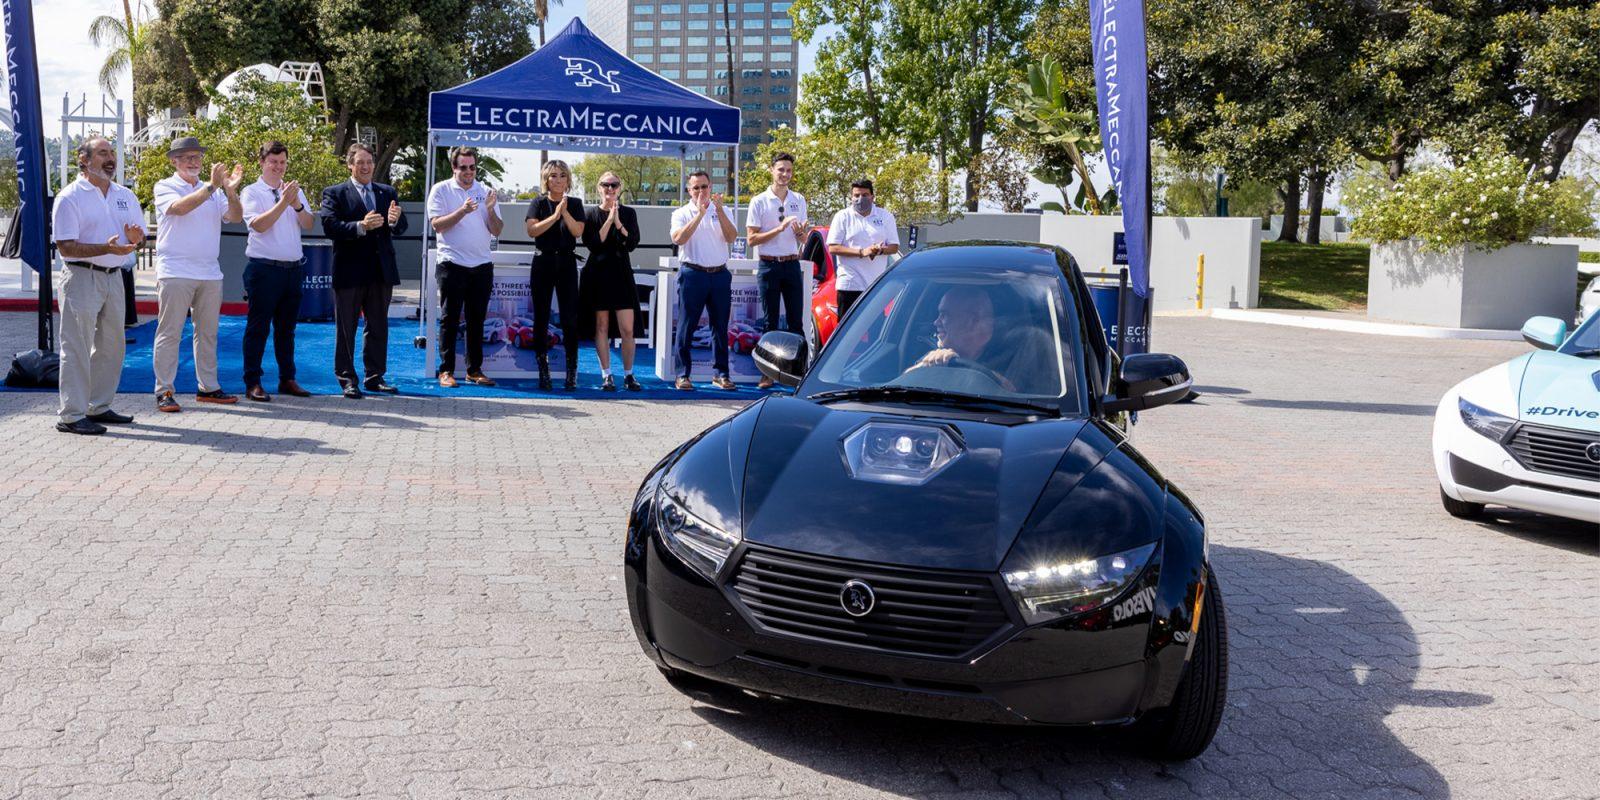 ElectraMeccanica begins customer deliveries of its SOLO EV